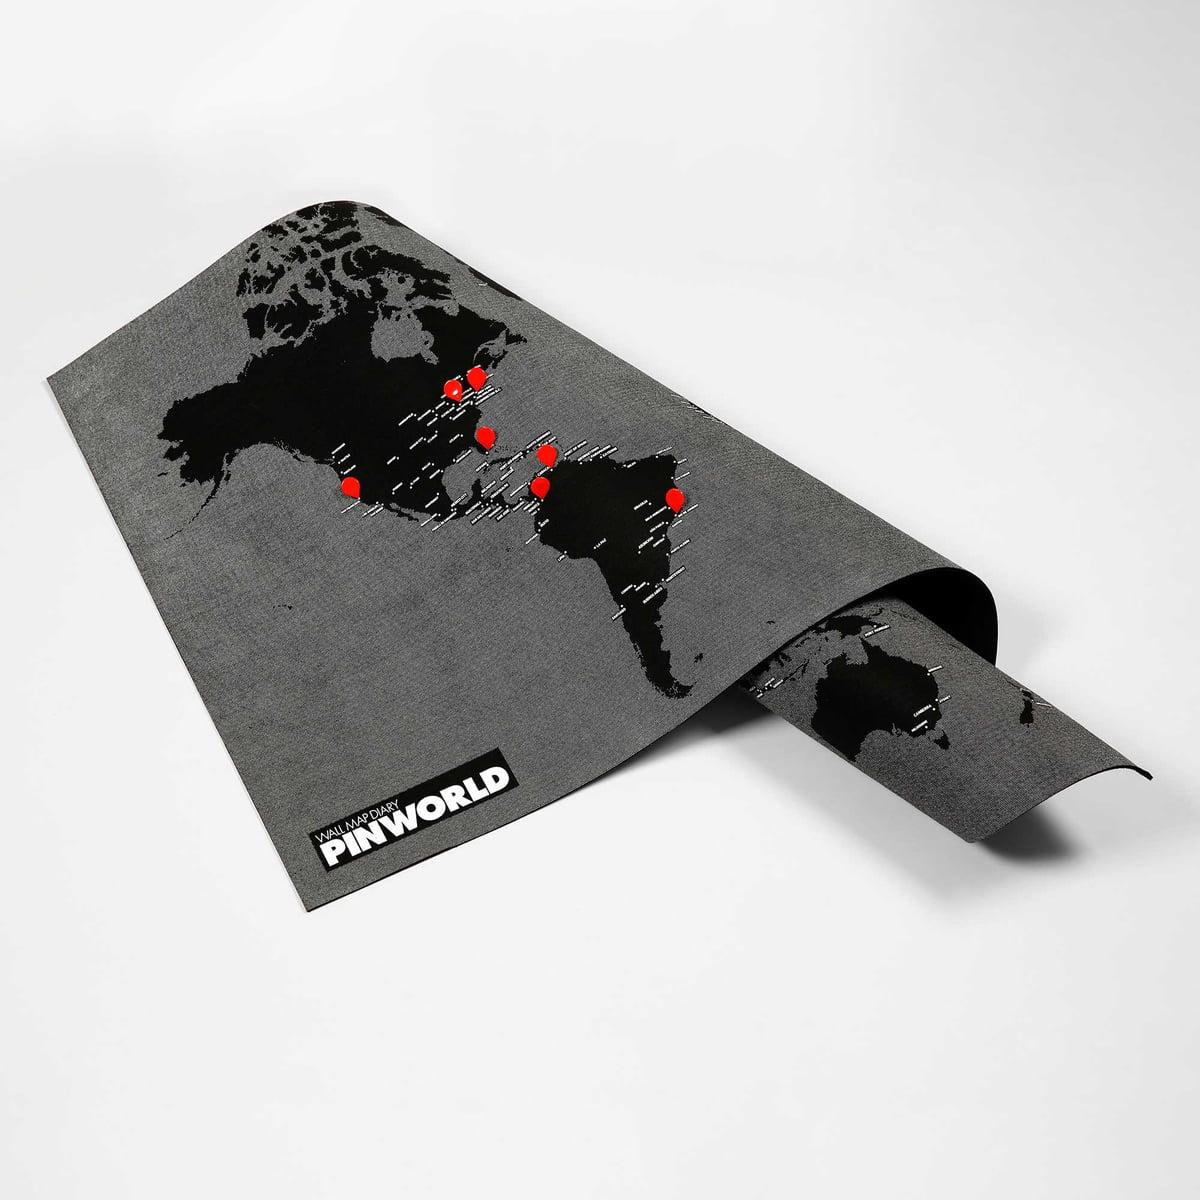 Pin world by palomar connox shop for Connox com